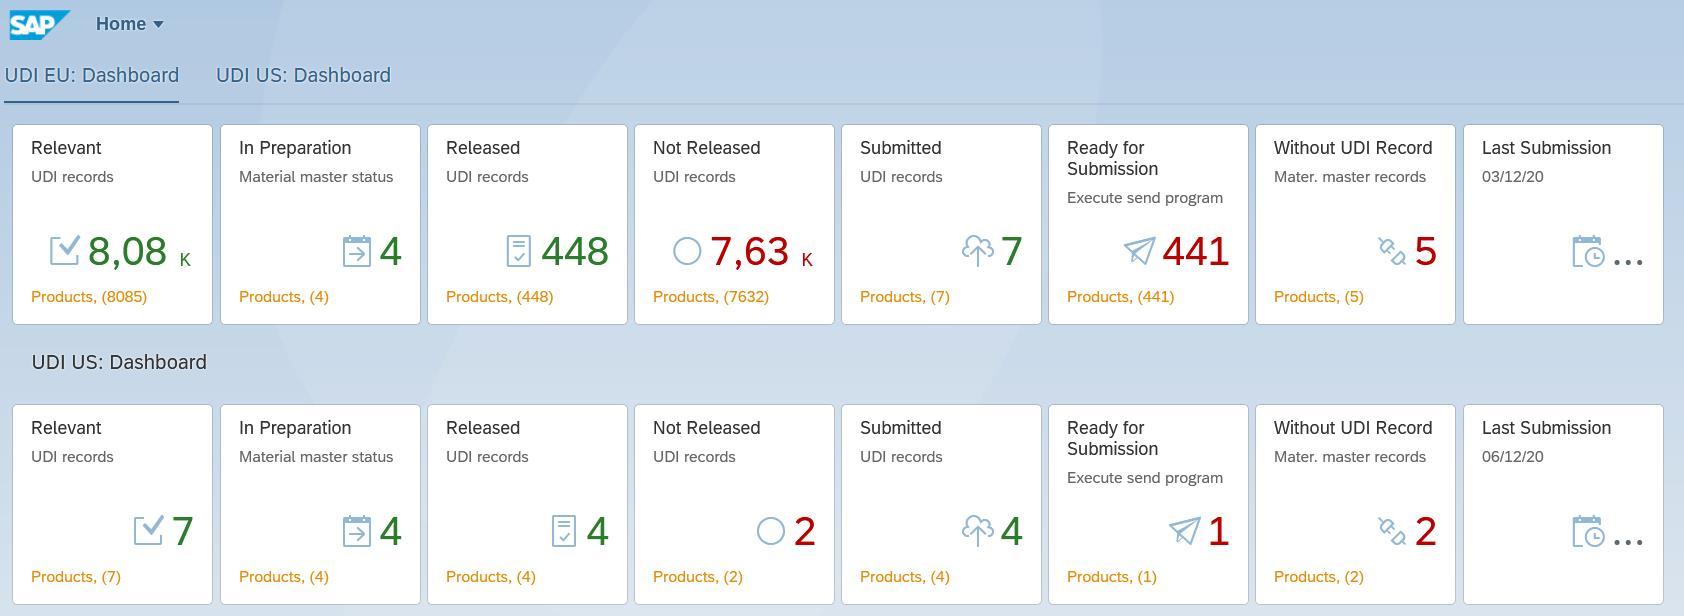 Global UDI SAP Fiori Dashboard / MDR and FDA